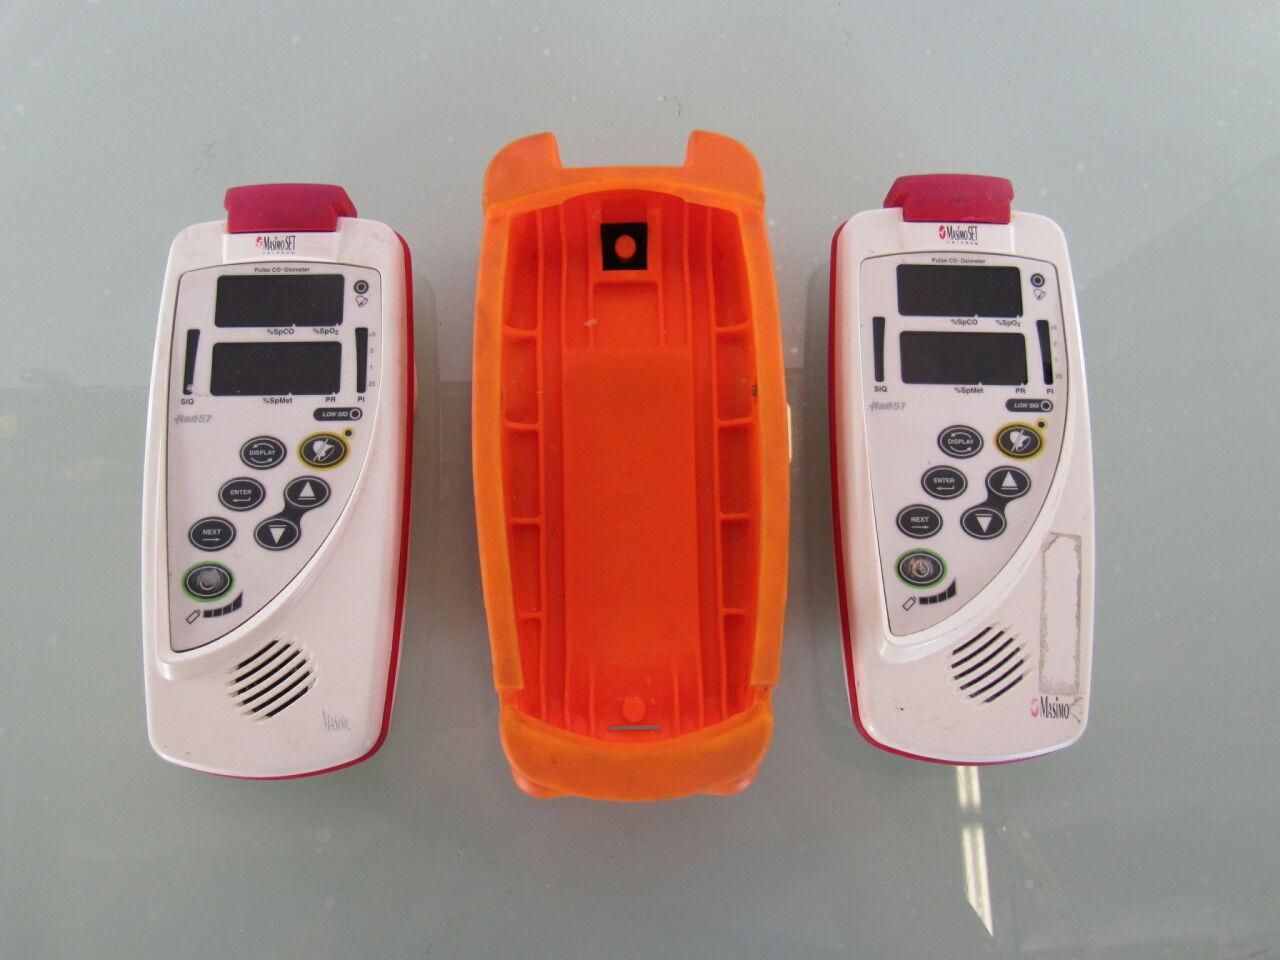 MASIMO RAD-57 RAD-87  - Lot of 2 Oximeter - Pulse